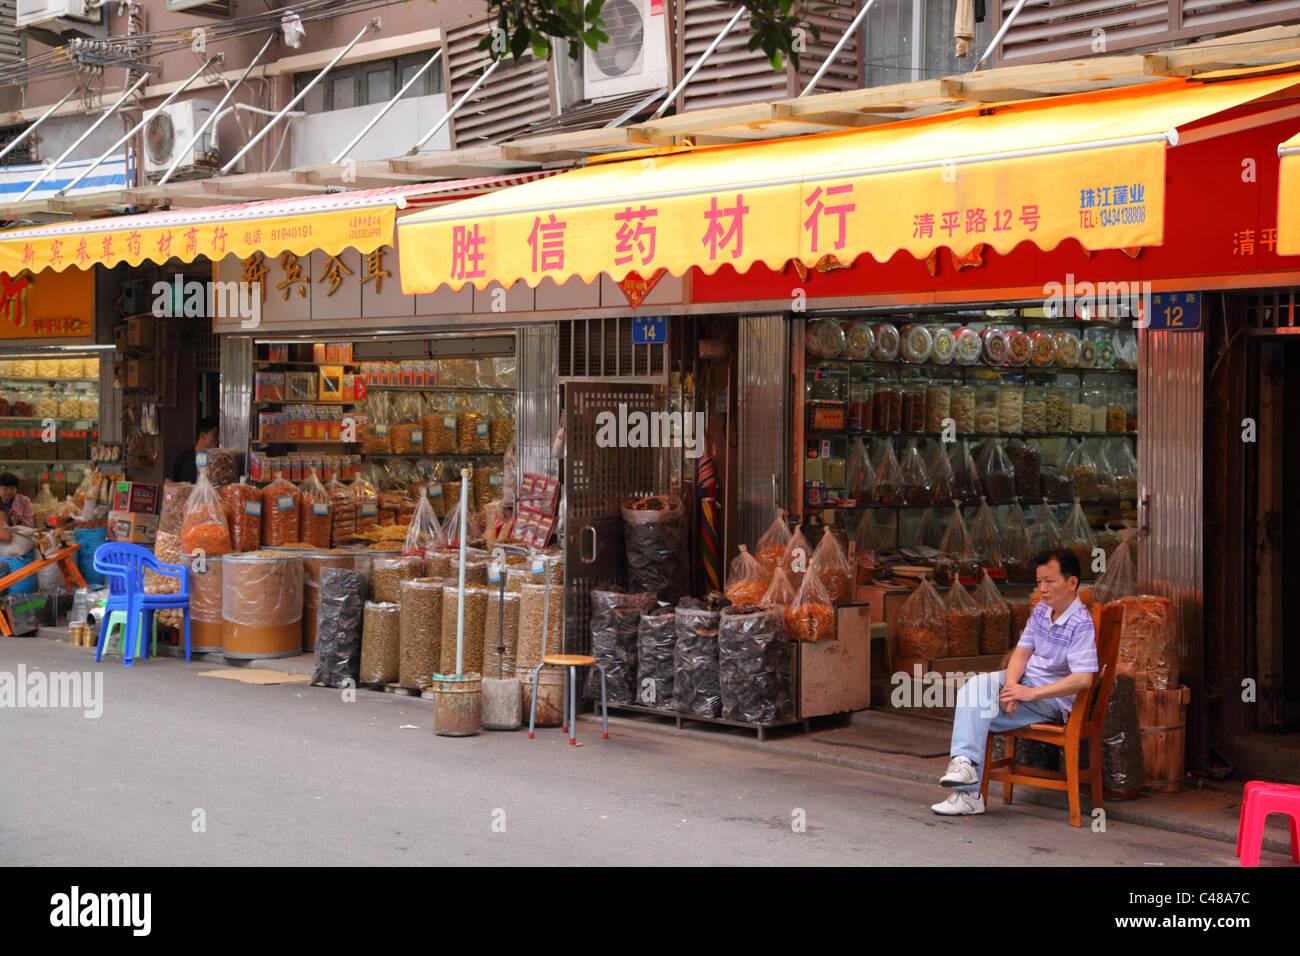 Arzneimittelmarkt, Guangzhou, China Stockbild